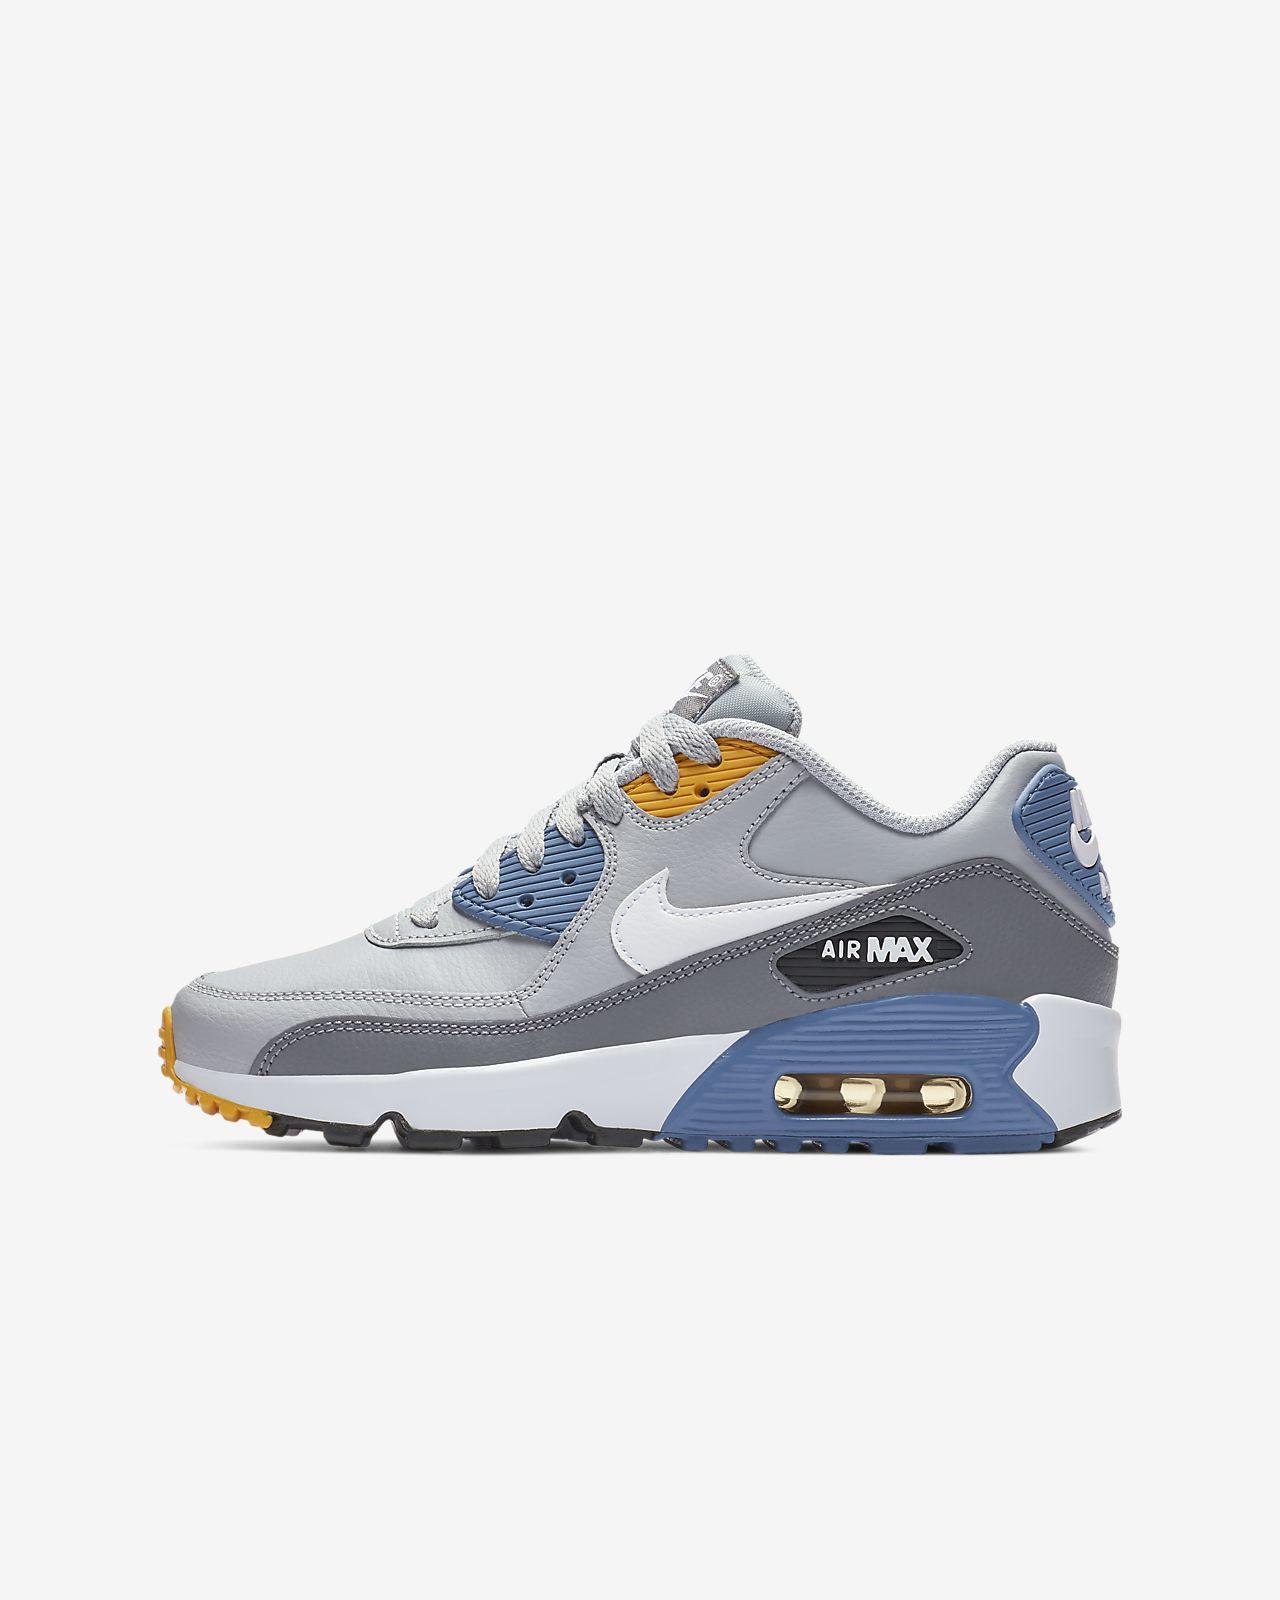 finest selection 4e15e 3864b Nike Air Max 90 Leather Schuh für ältere Kinder